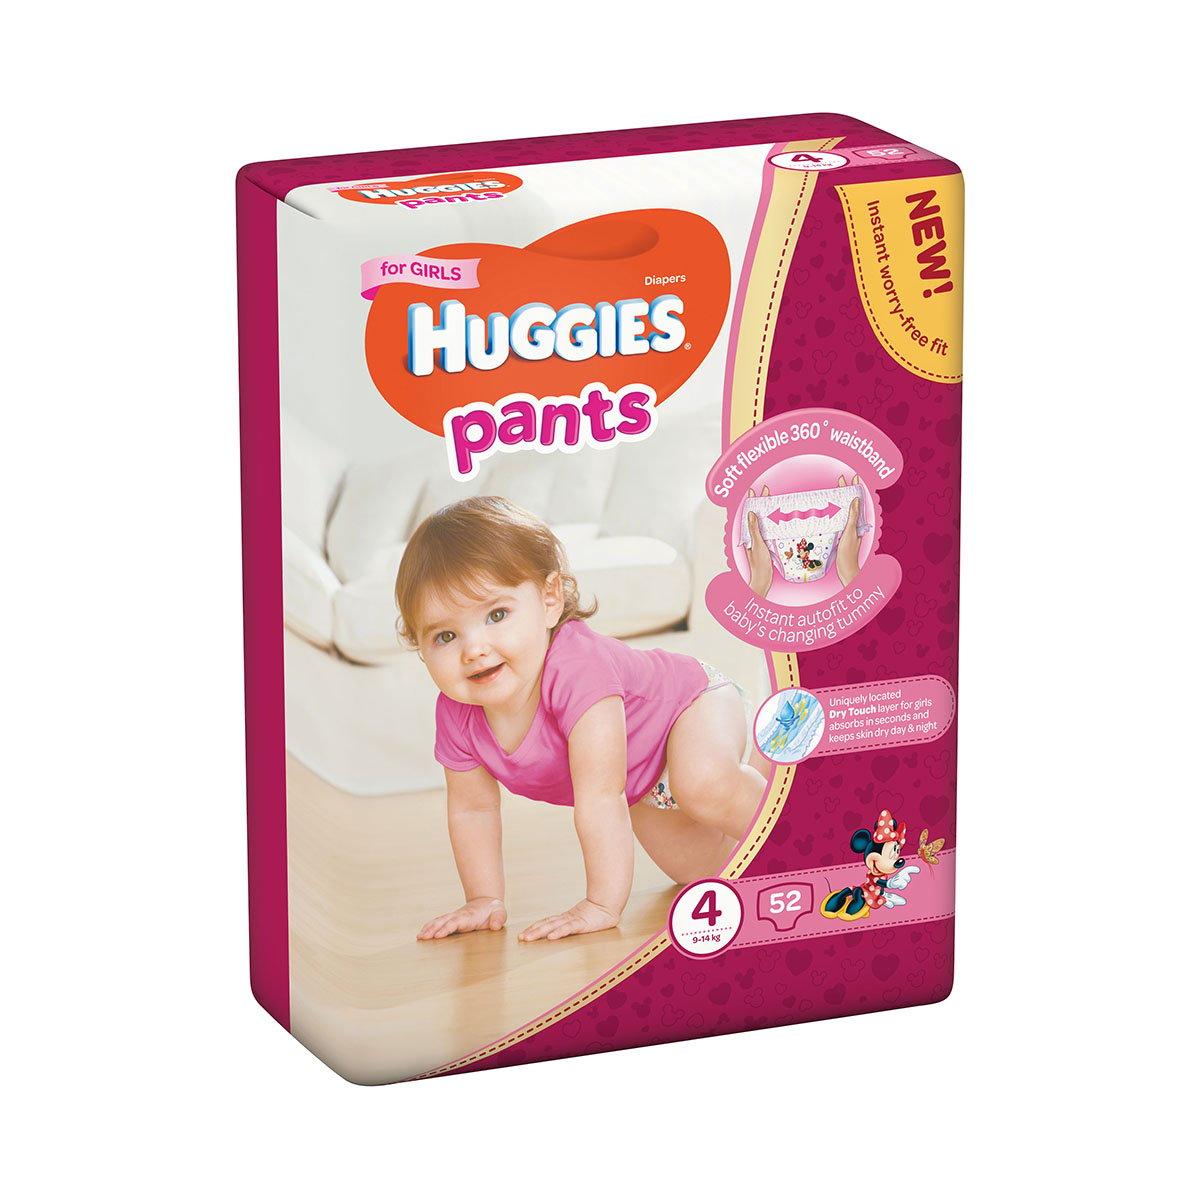 Scutece Huggies Mega Pants Girls, Nr 4, 9 - 14 Kg, 52 buc imagine